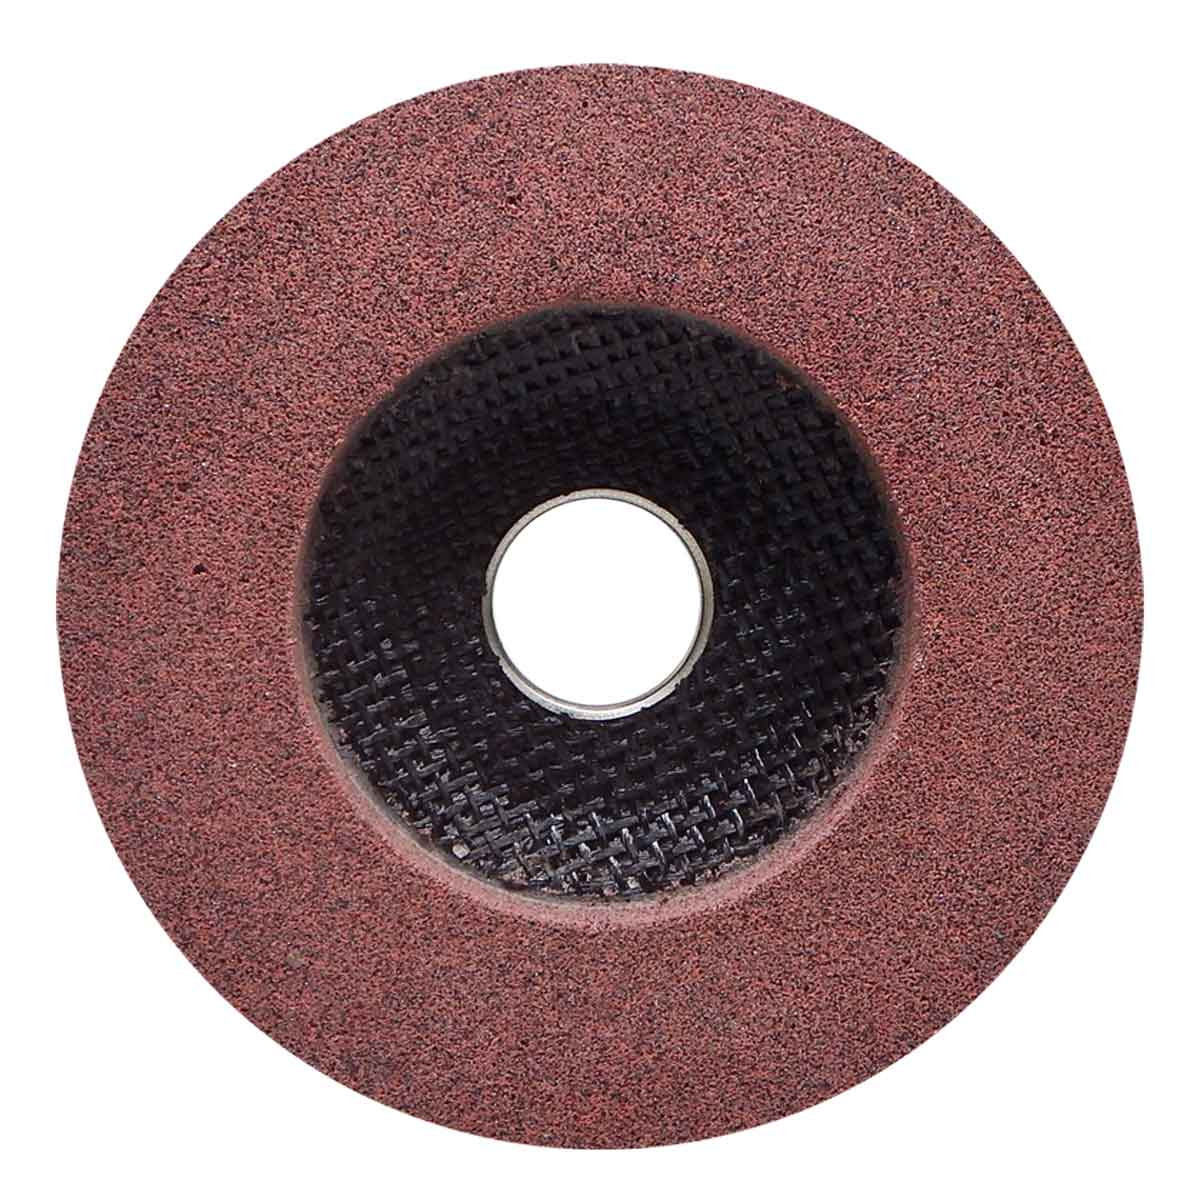 Alpha Tools PVA VP Dry Polishing Disc - Coarse Grit